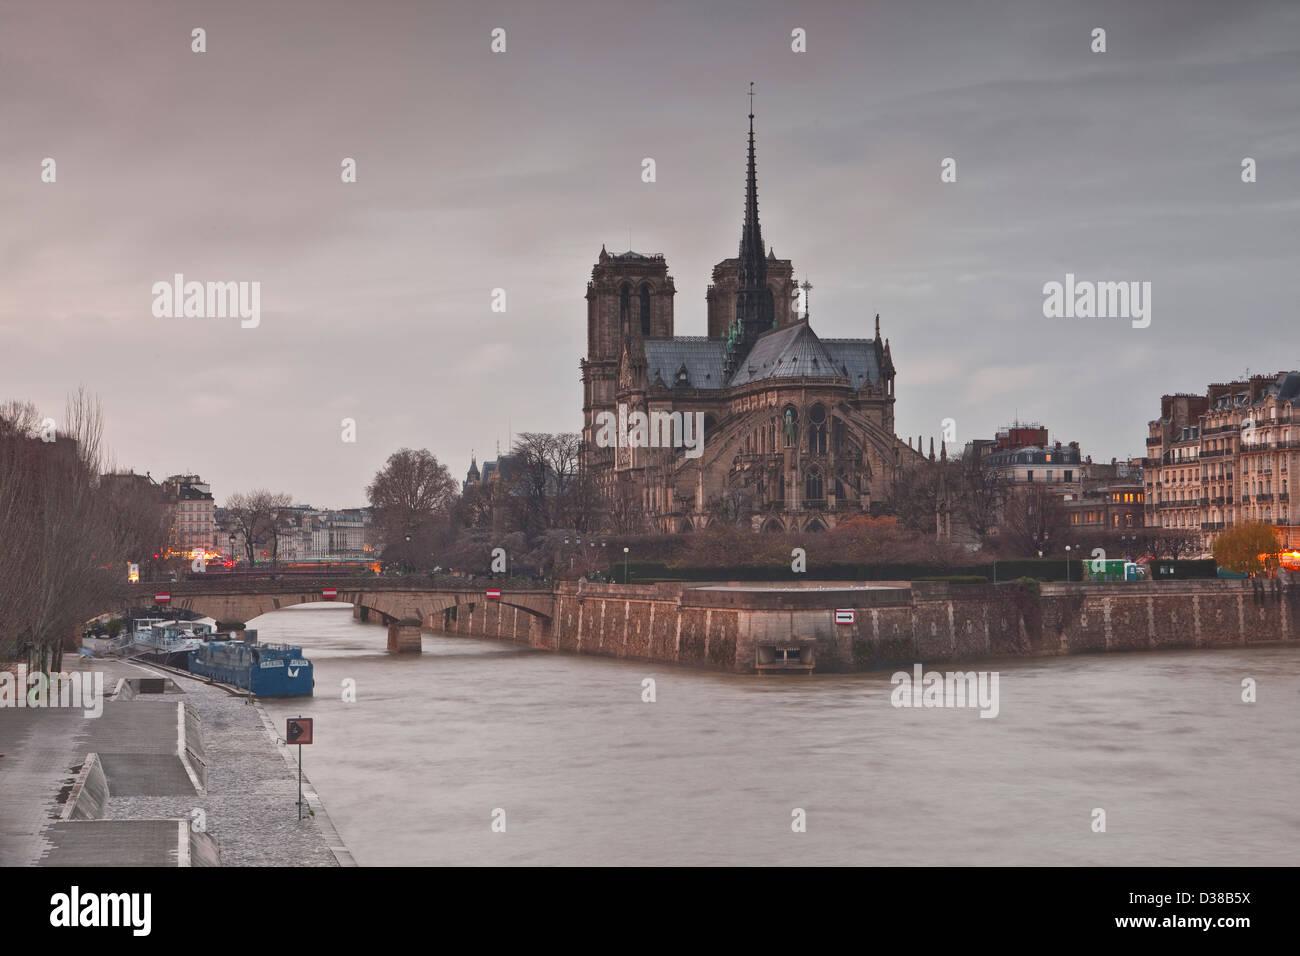 Notre Dame de Paris cathedral and the river Seine. - Stock Image